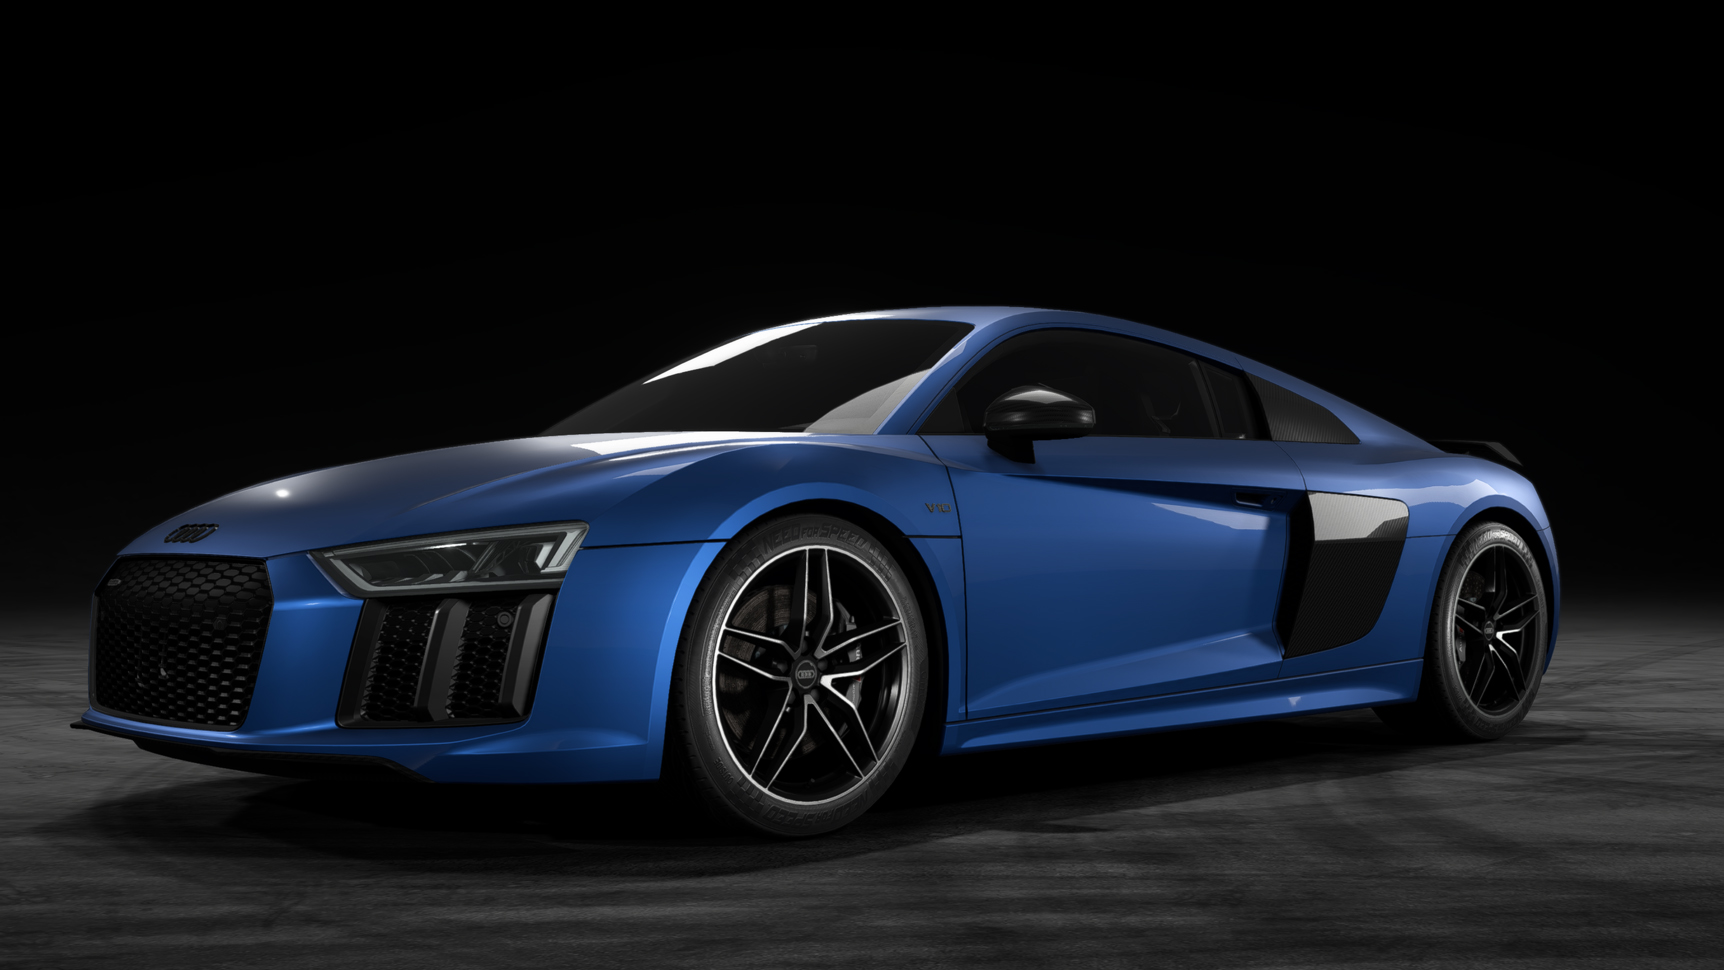 Audi R8 V10 Plus (Gen. 2)